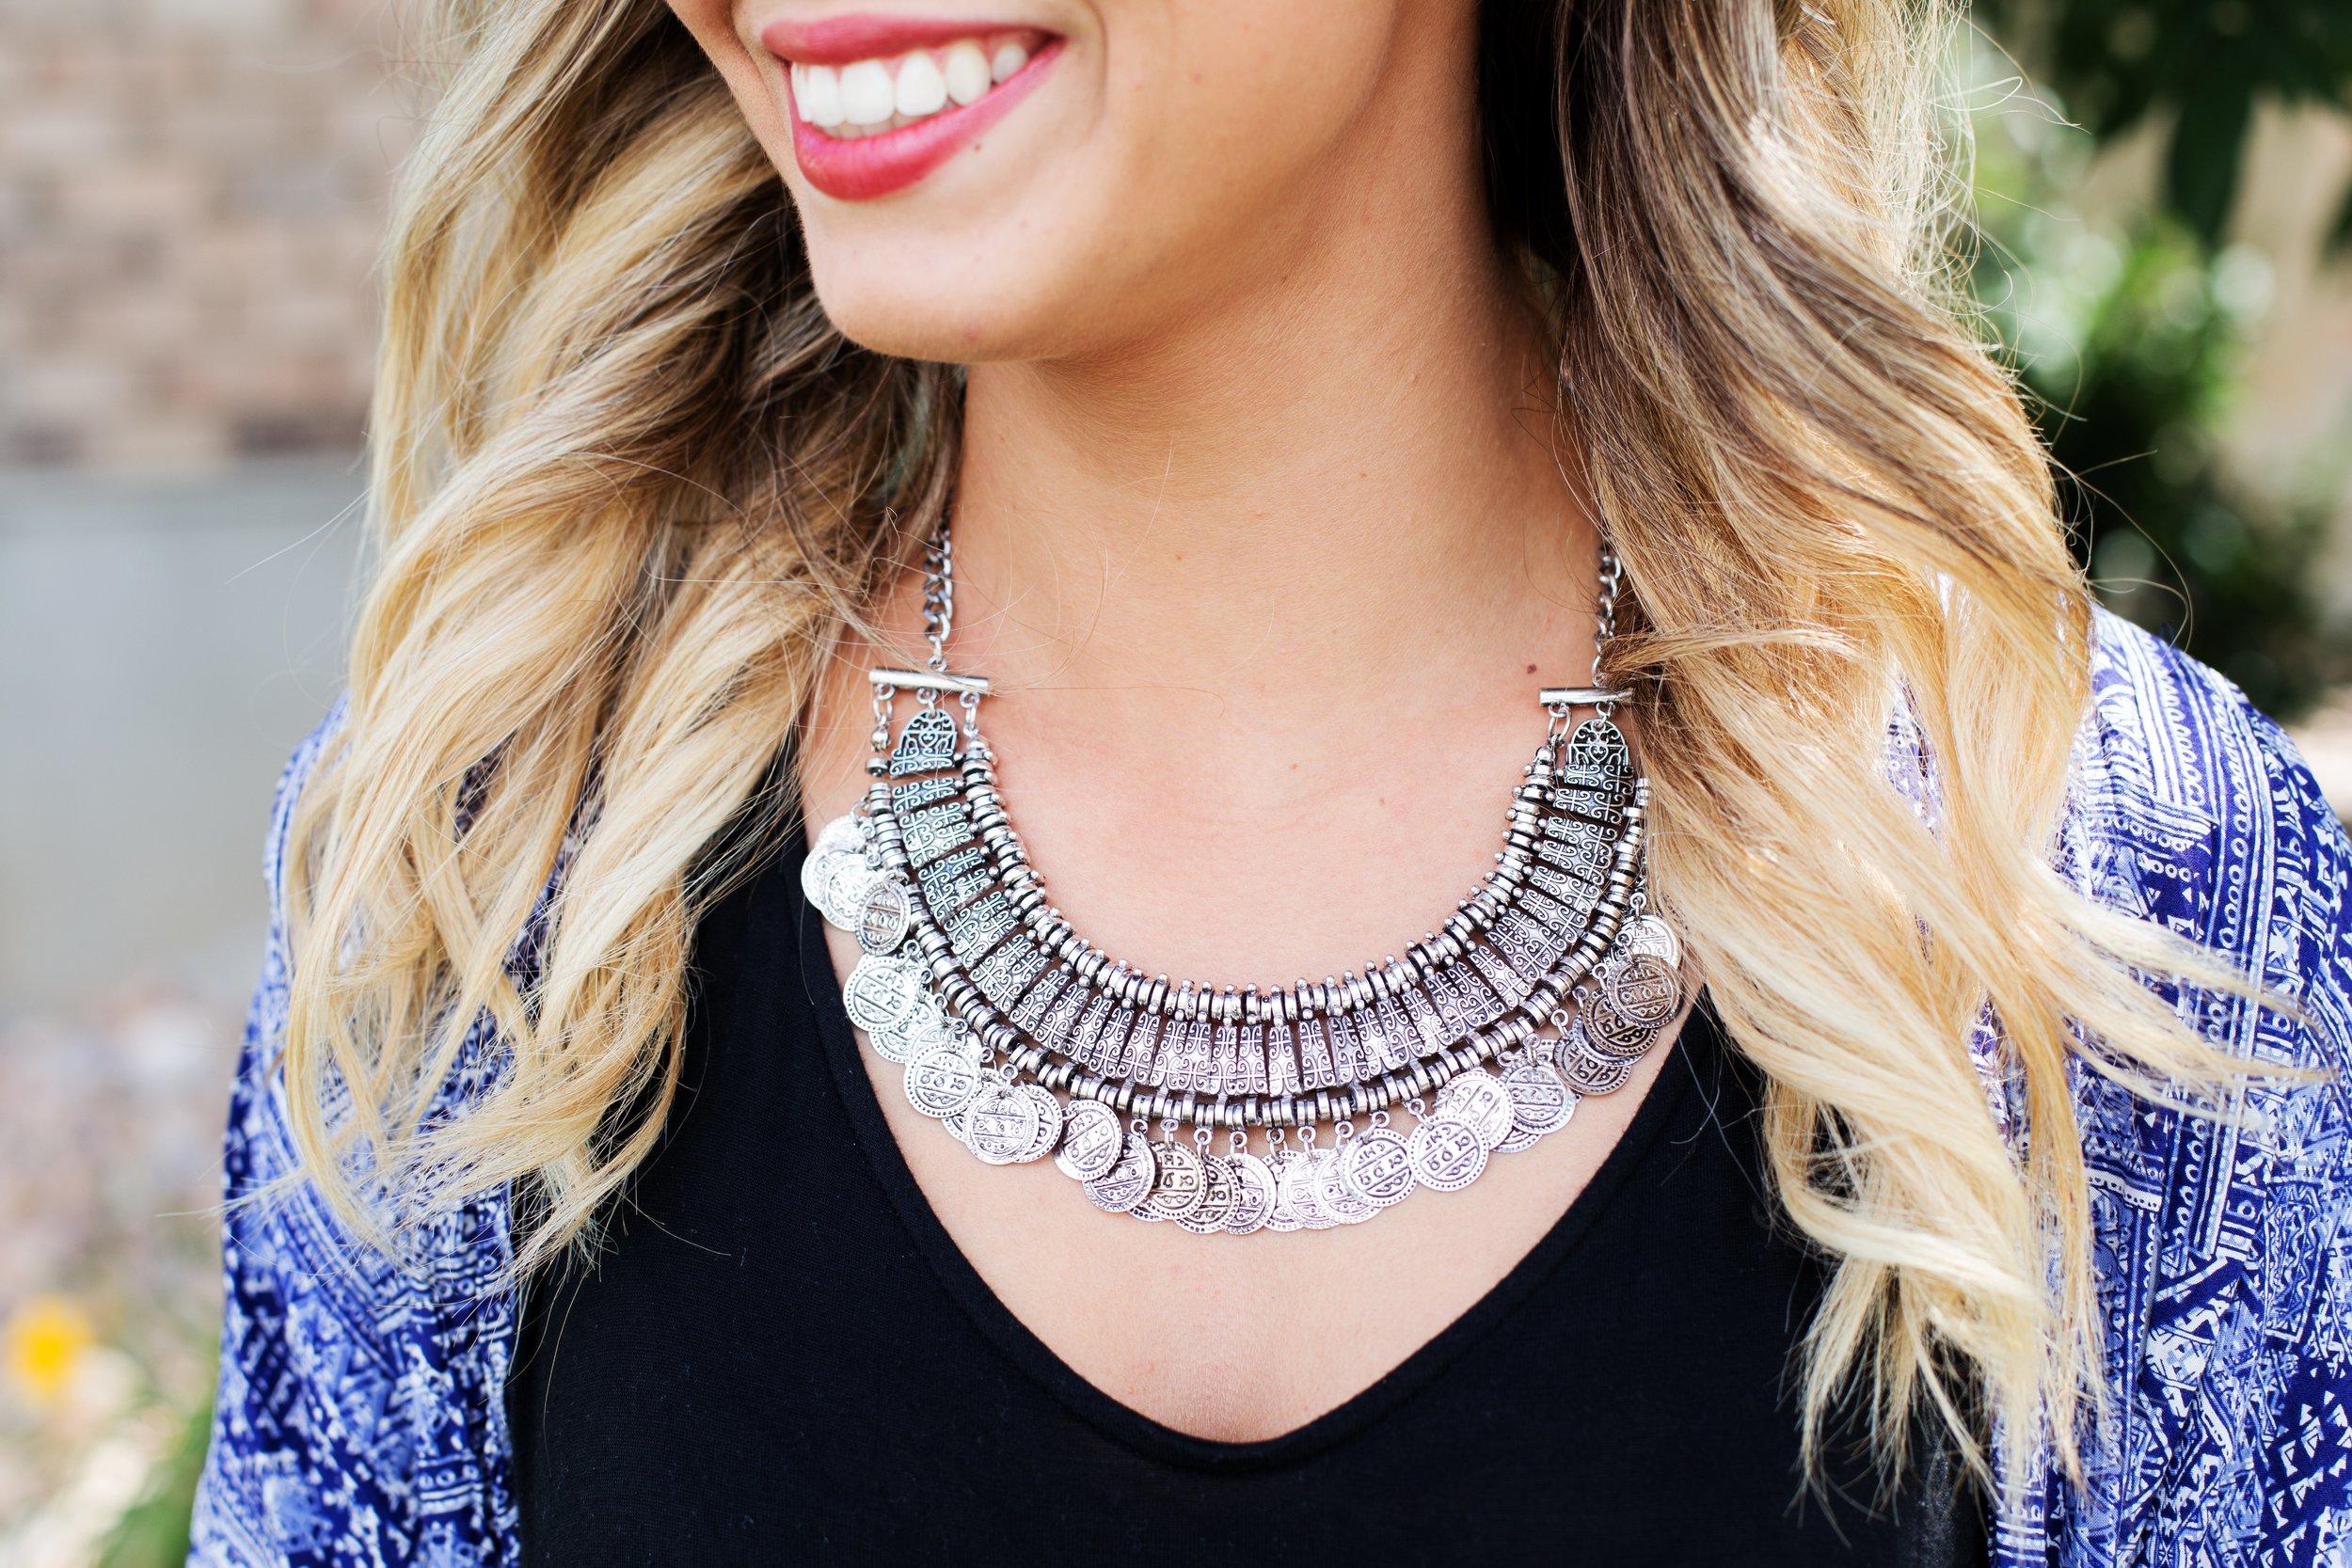 woman necklace.jpeg